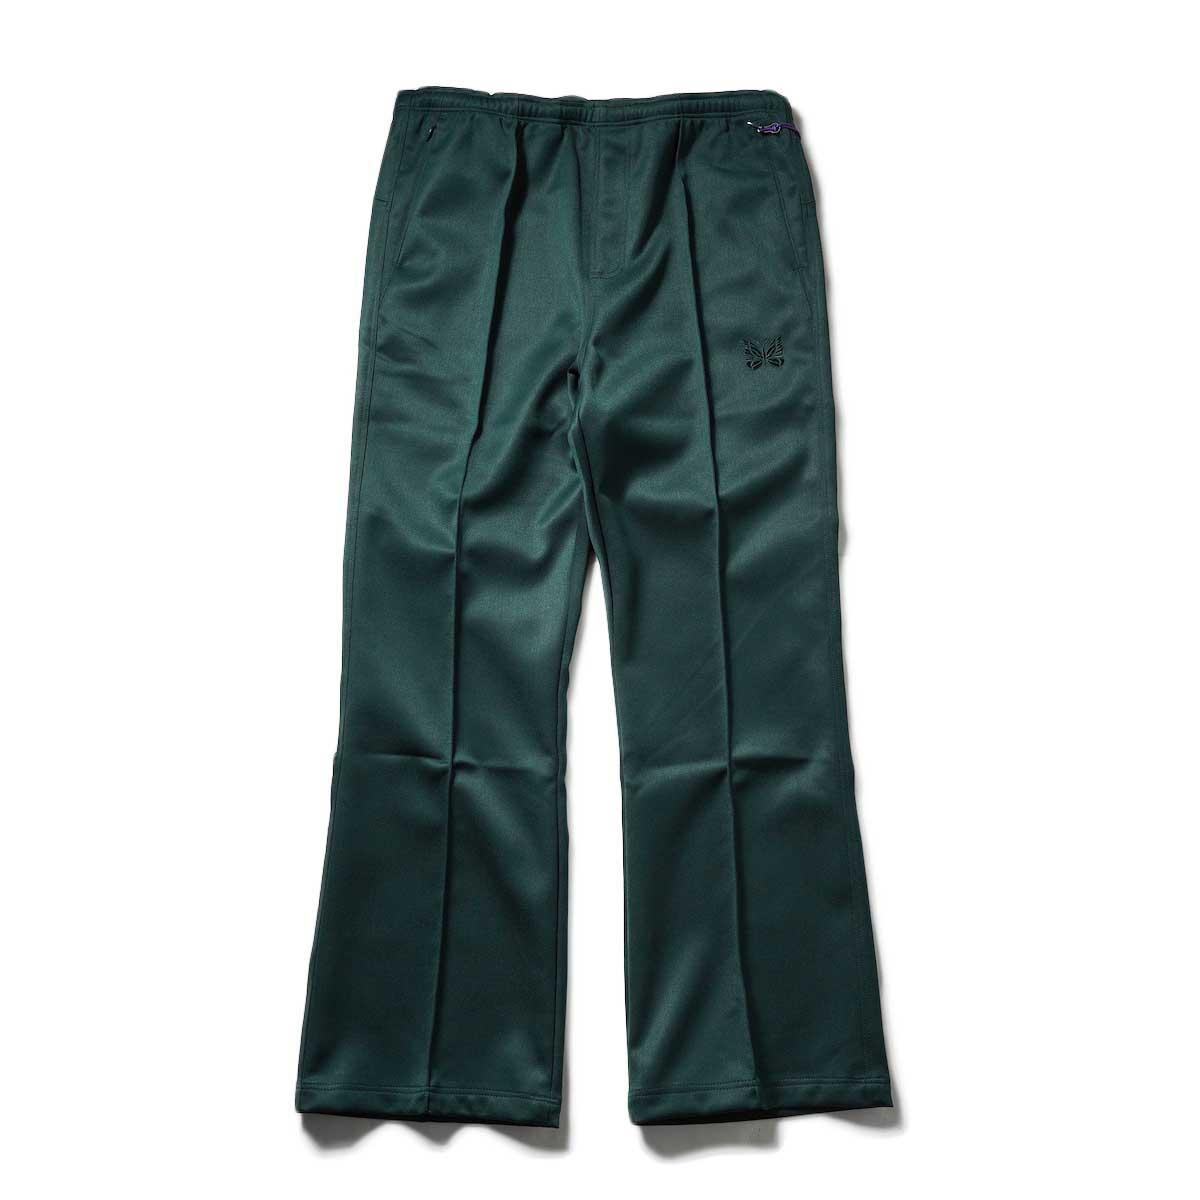 Needles / W.U. BOOT-CUT PANT - PE/R DOESKIN (Green)